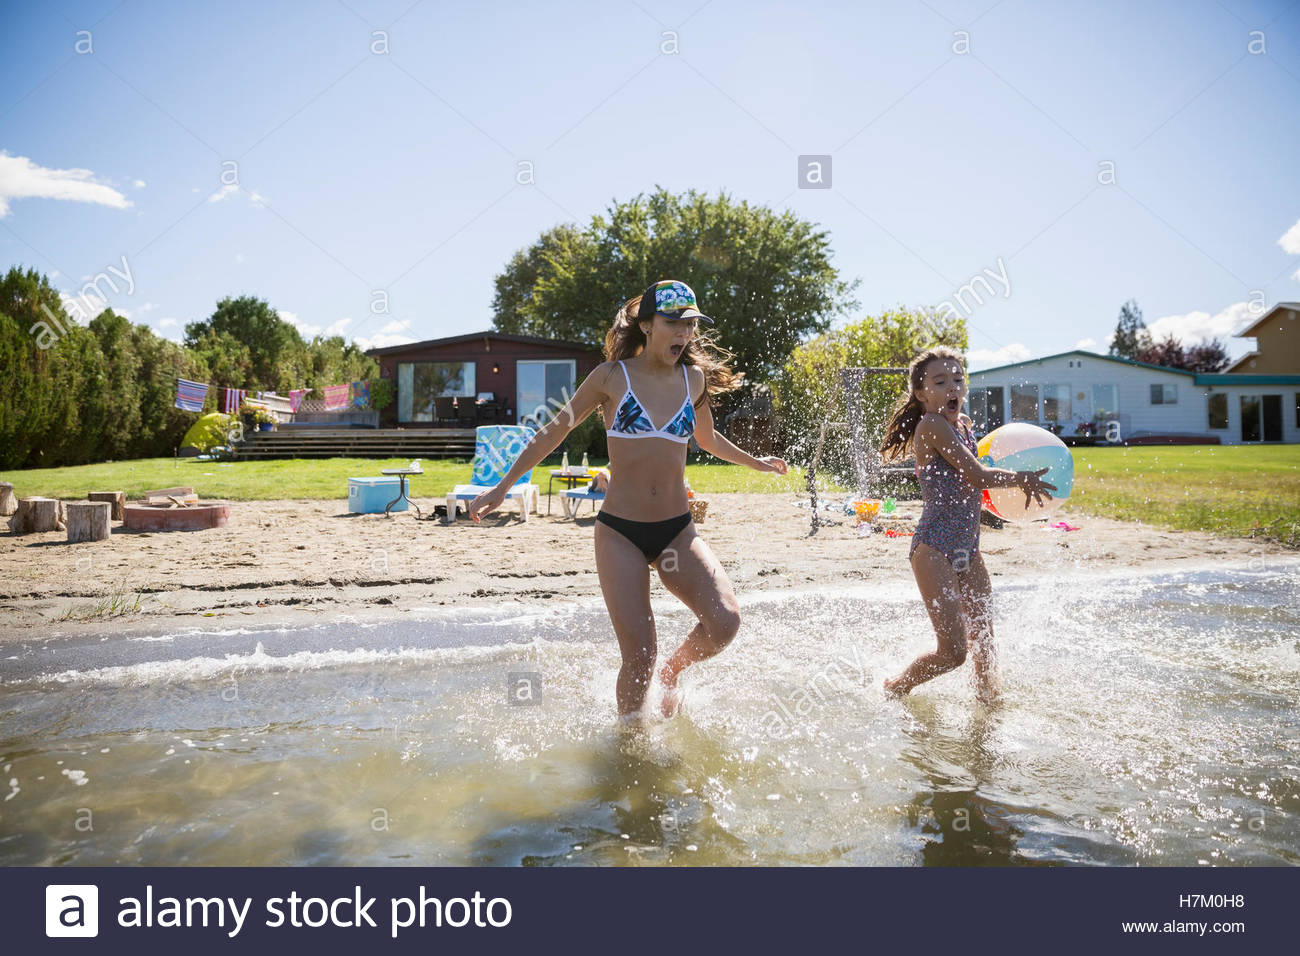 Sisters running and splashing in sunny summer lake - Stock Image